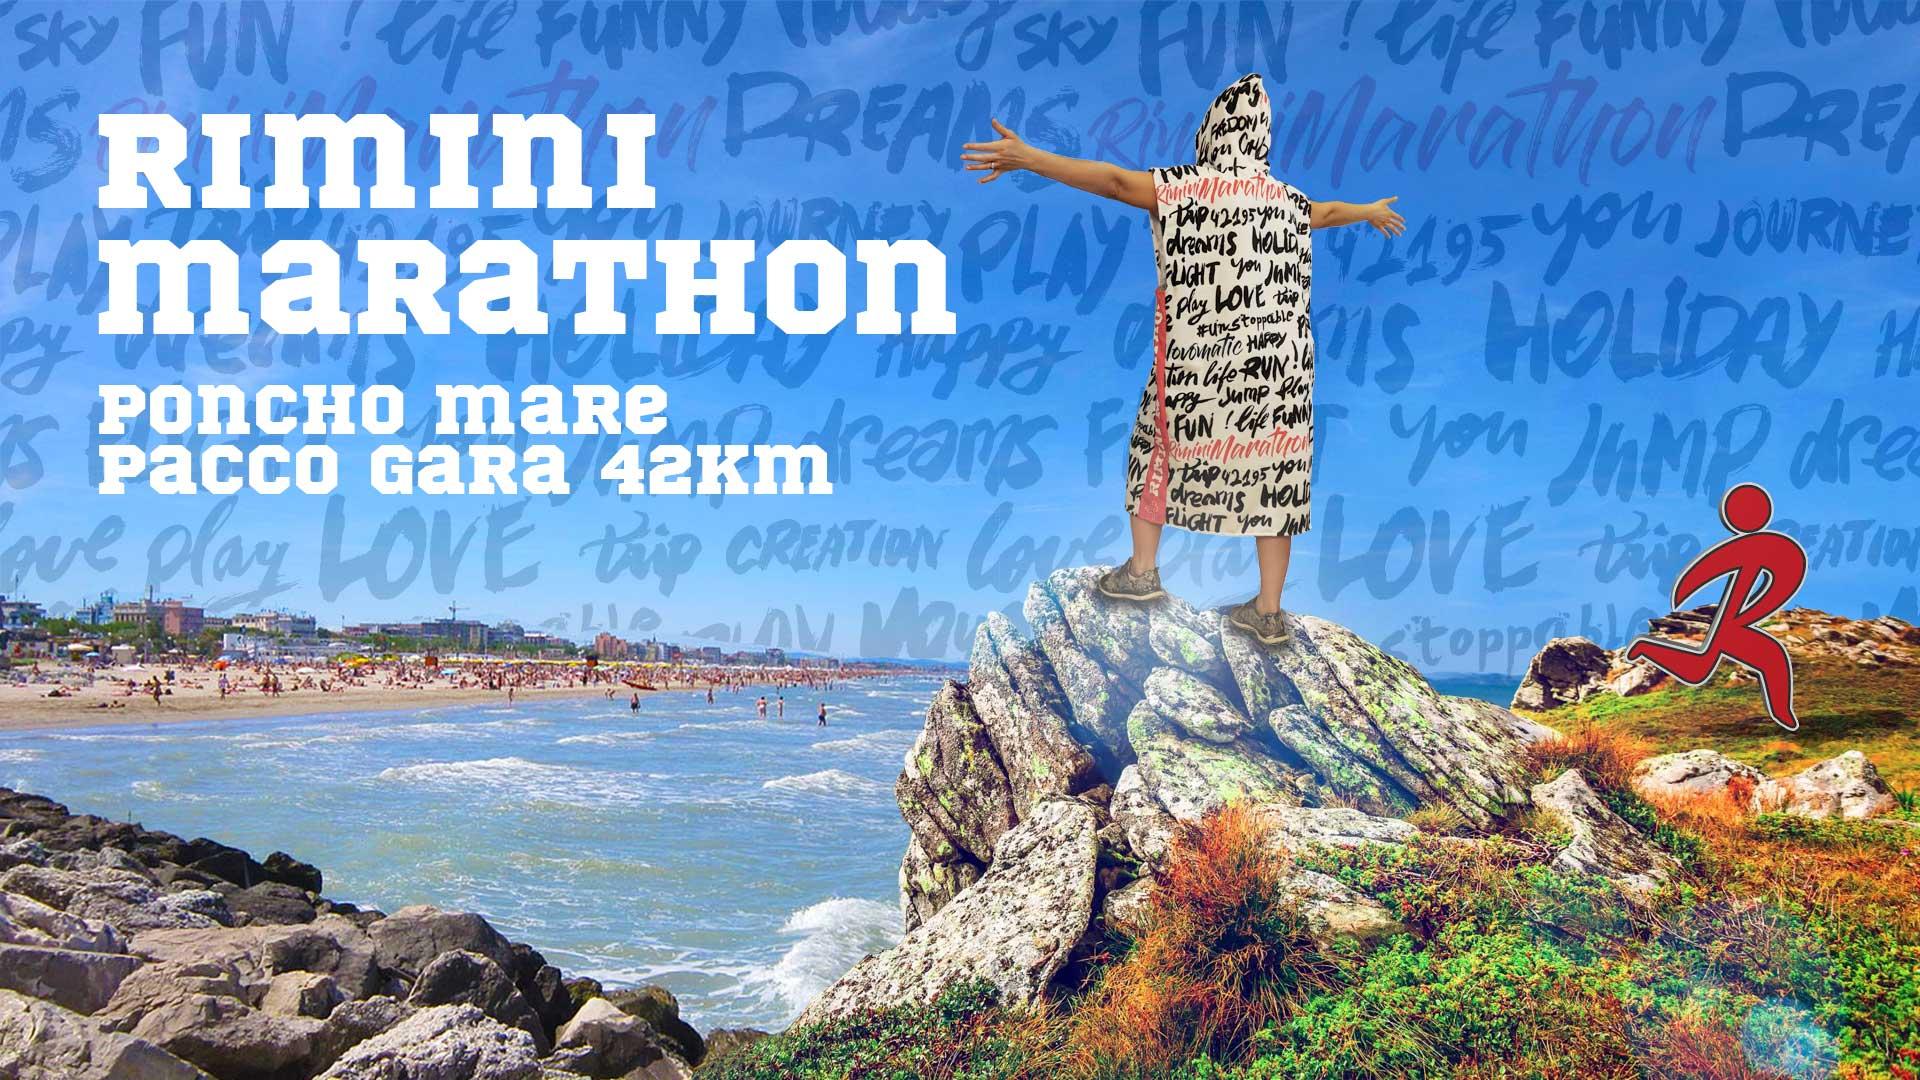 pacco-gara-rimini-marathon-2018